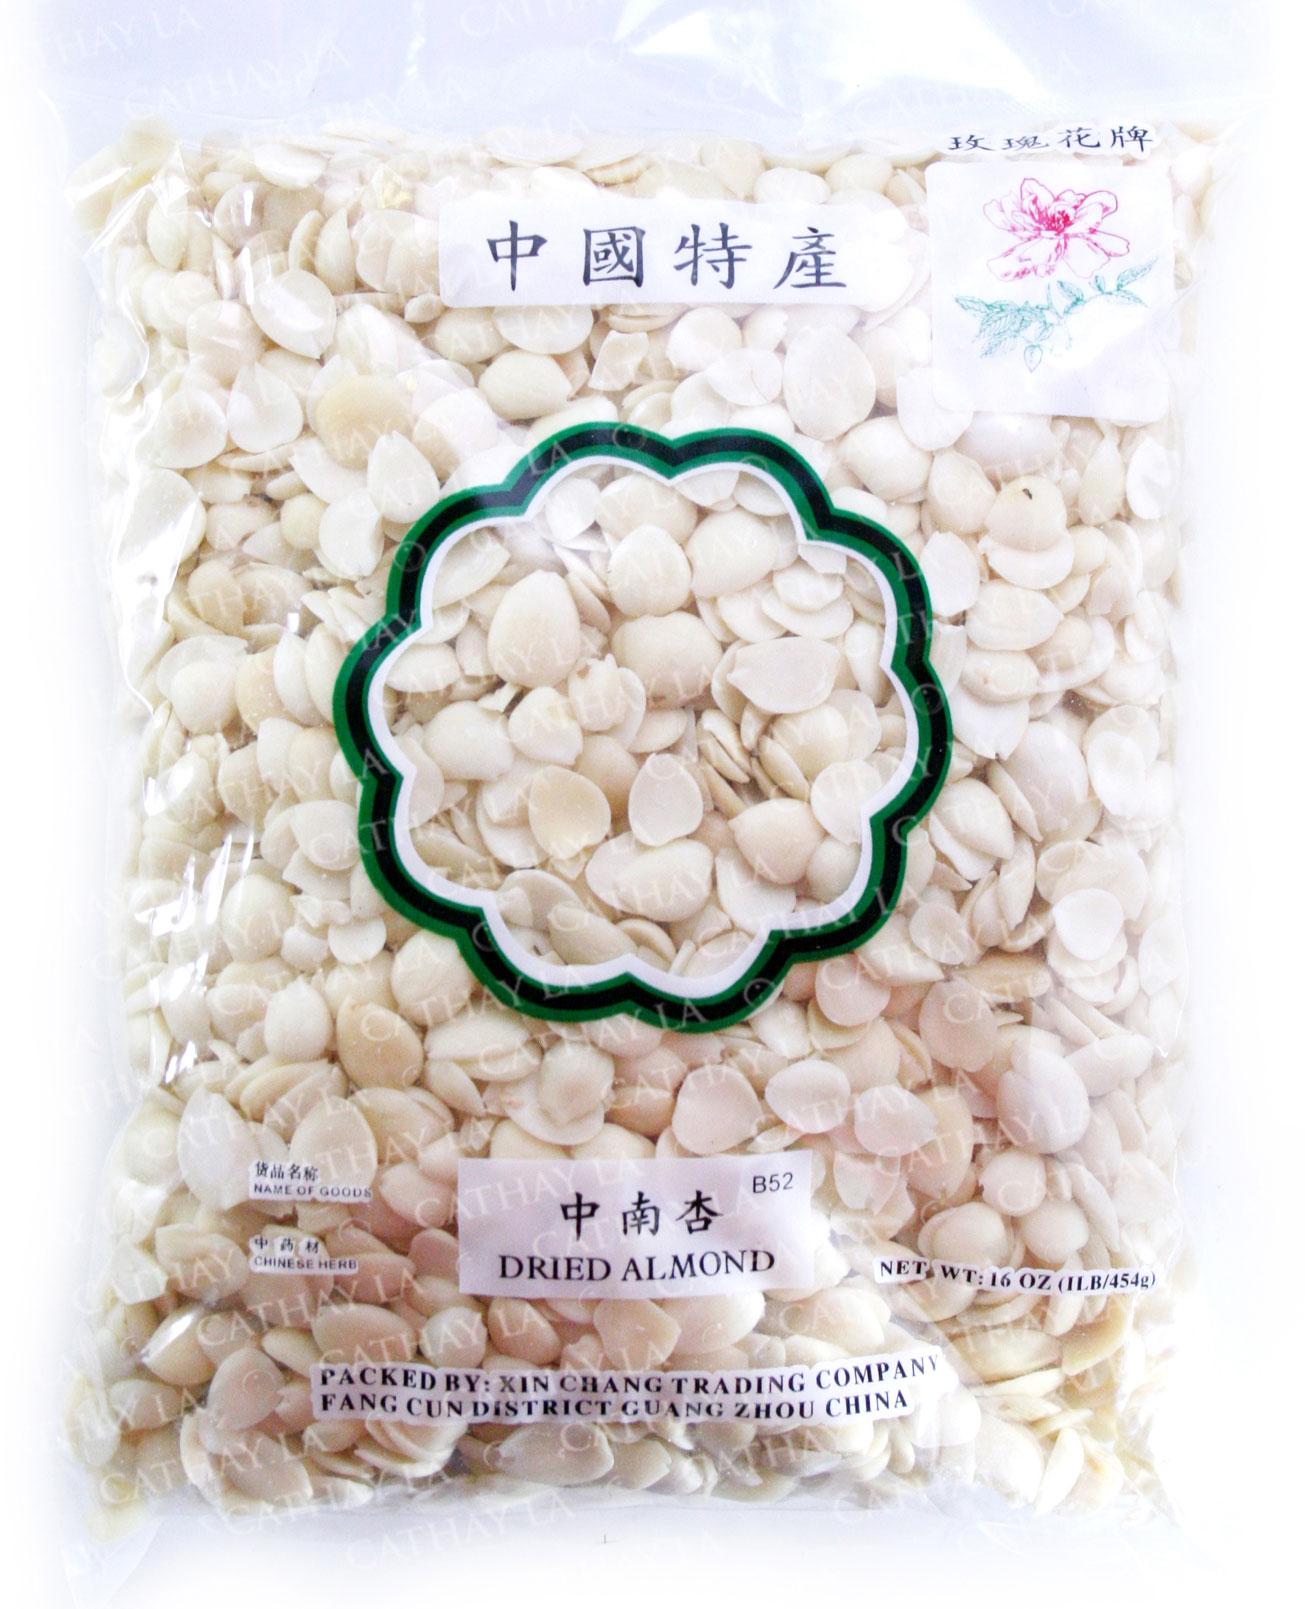 Dried Almond Sorth Cathay La